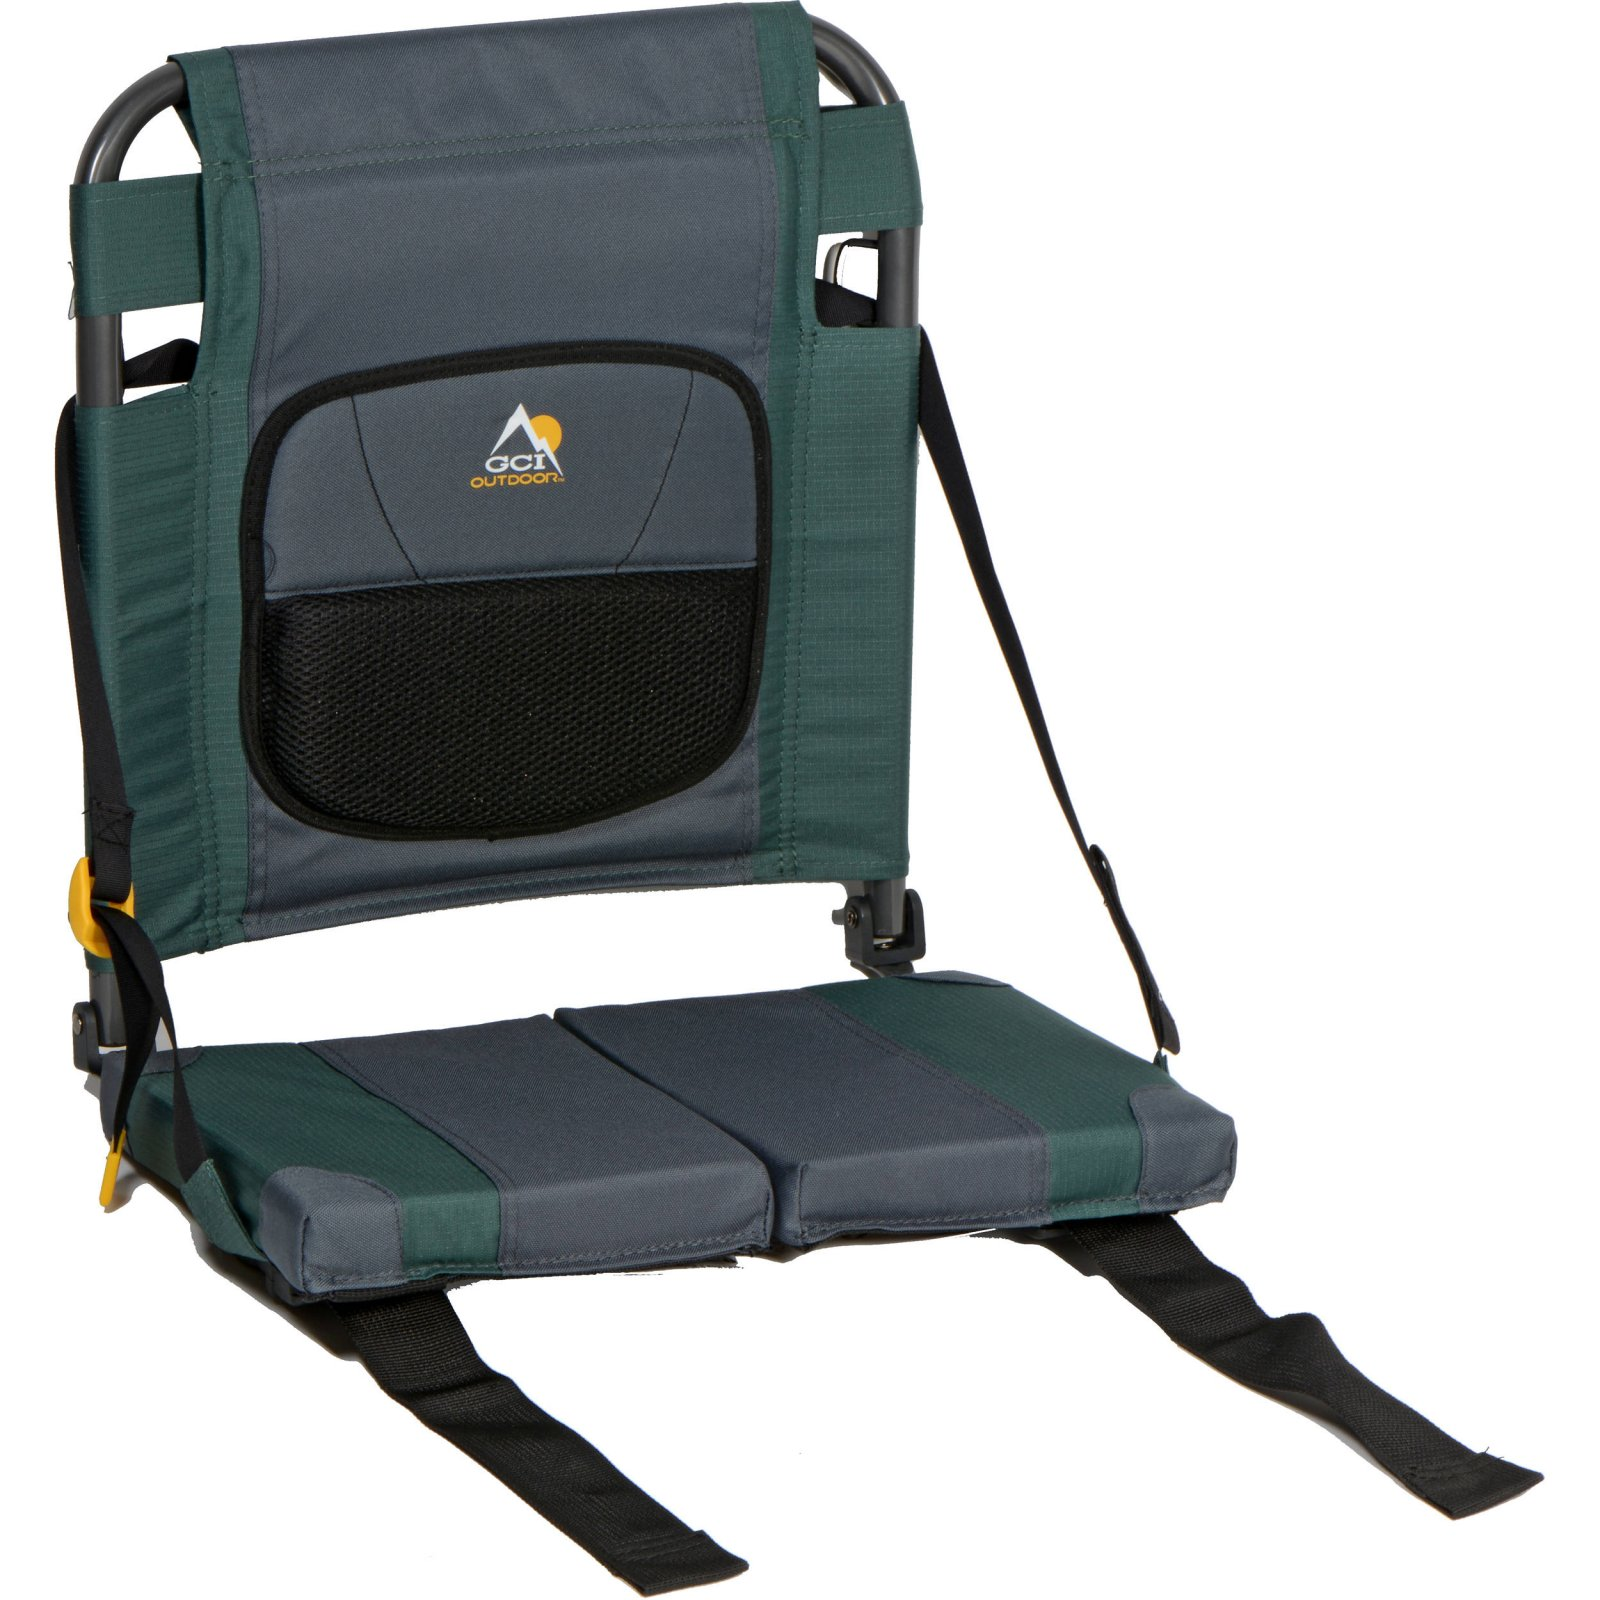 Sitbacker Canoe Seat